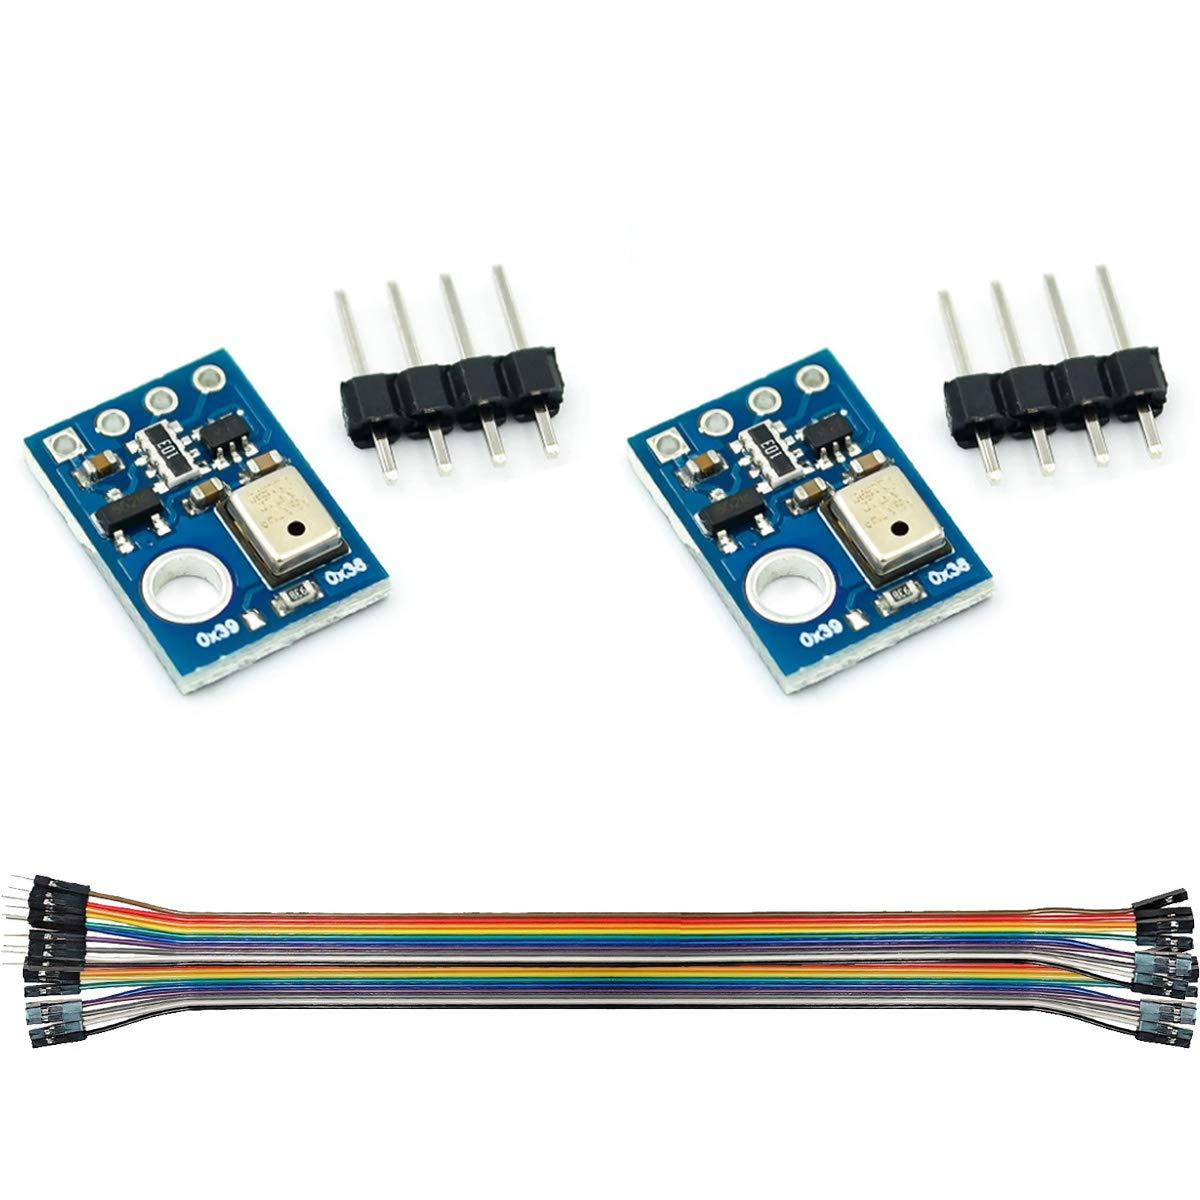 DAOKI 2Pcs Temperature and Humidity Sensor Module AHT10 Measurem